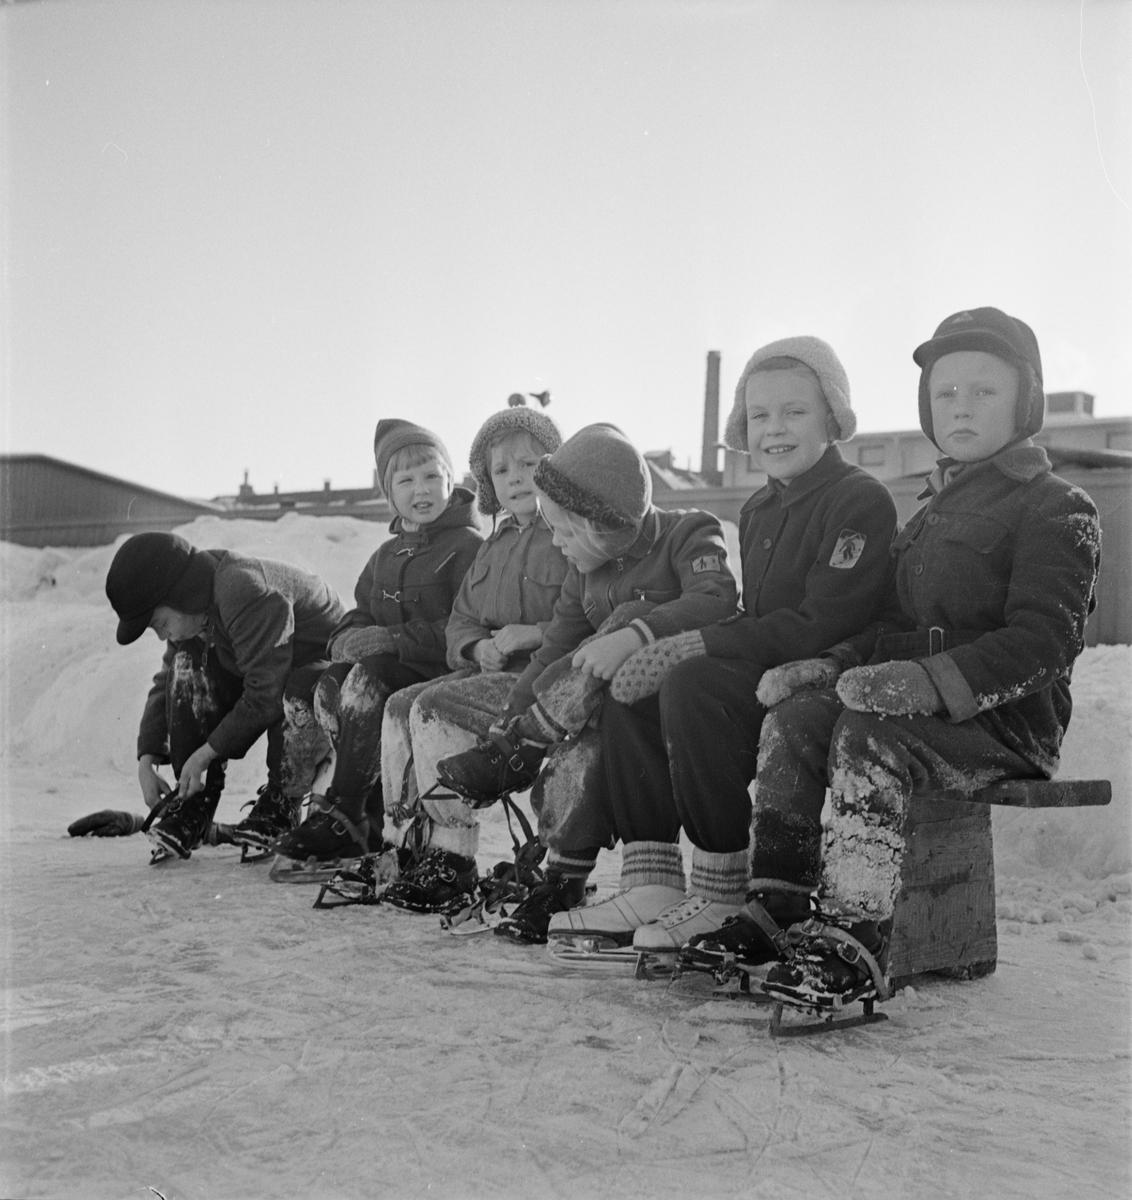 Vinter - barn i Slottsbacken, Uppsala februari 1954